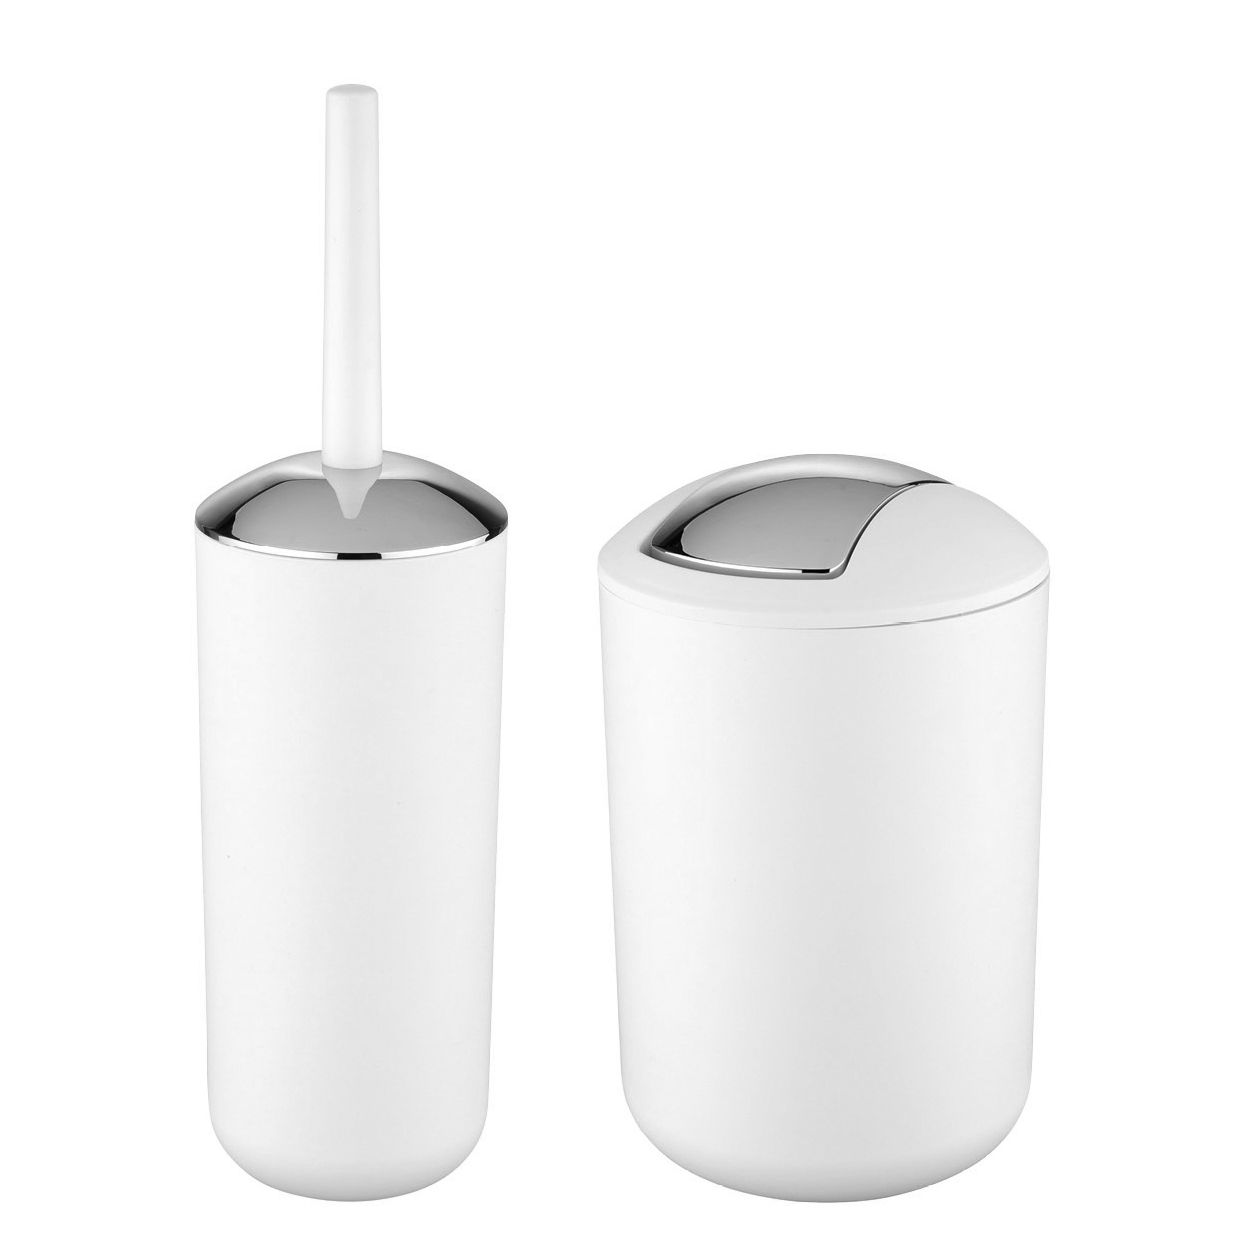 Accessoires-Set Brasil (2-teilig) - Kunststoff - Weiß / Silber, Wenko